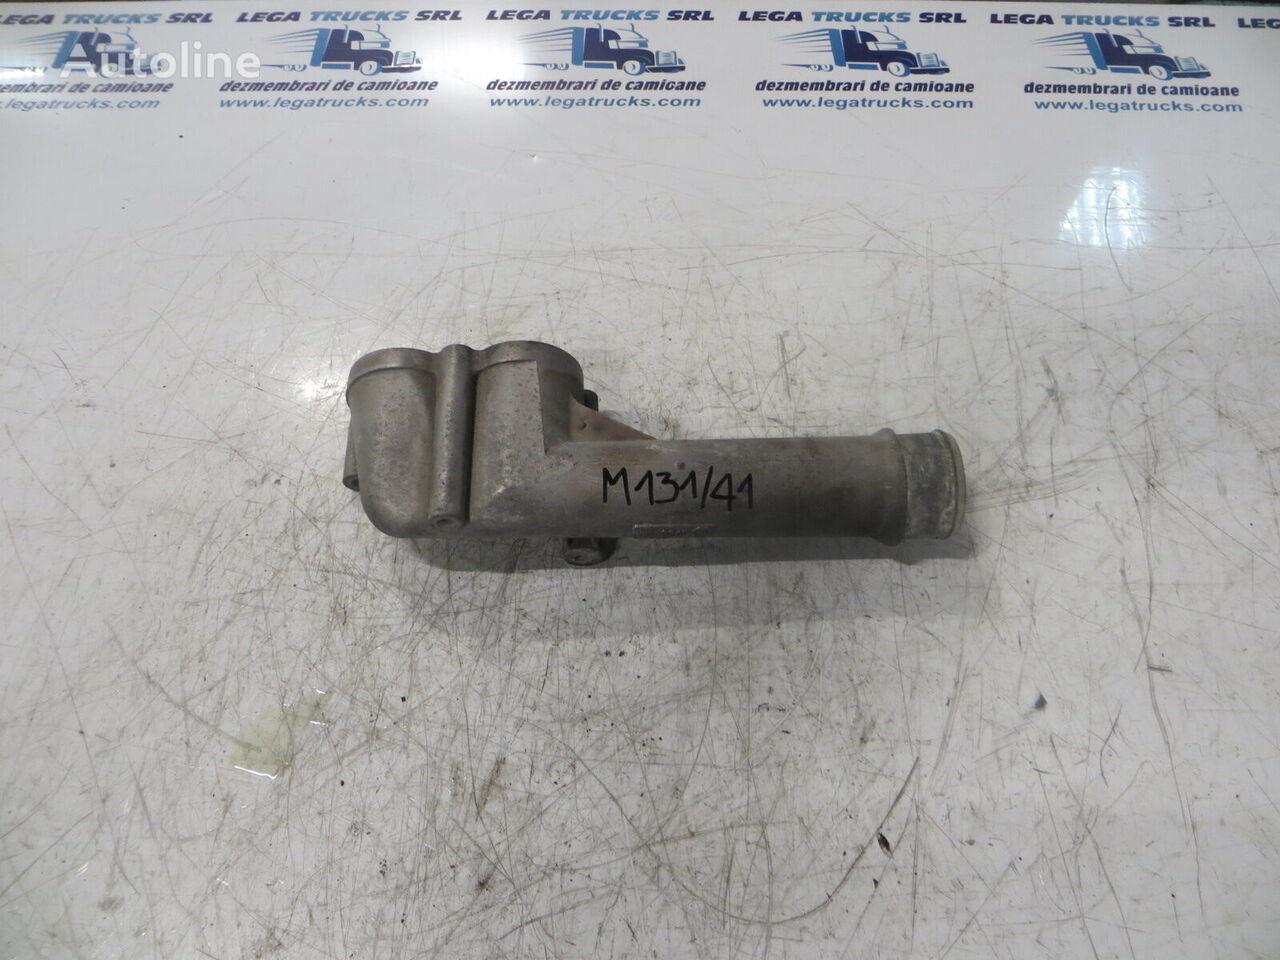 MAN M131/41 (M131/41) termostato para MAN TGX 440 tractora